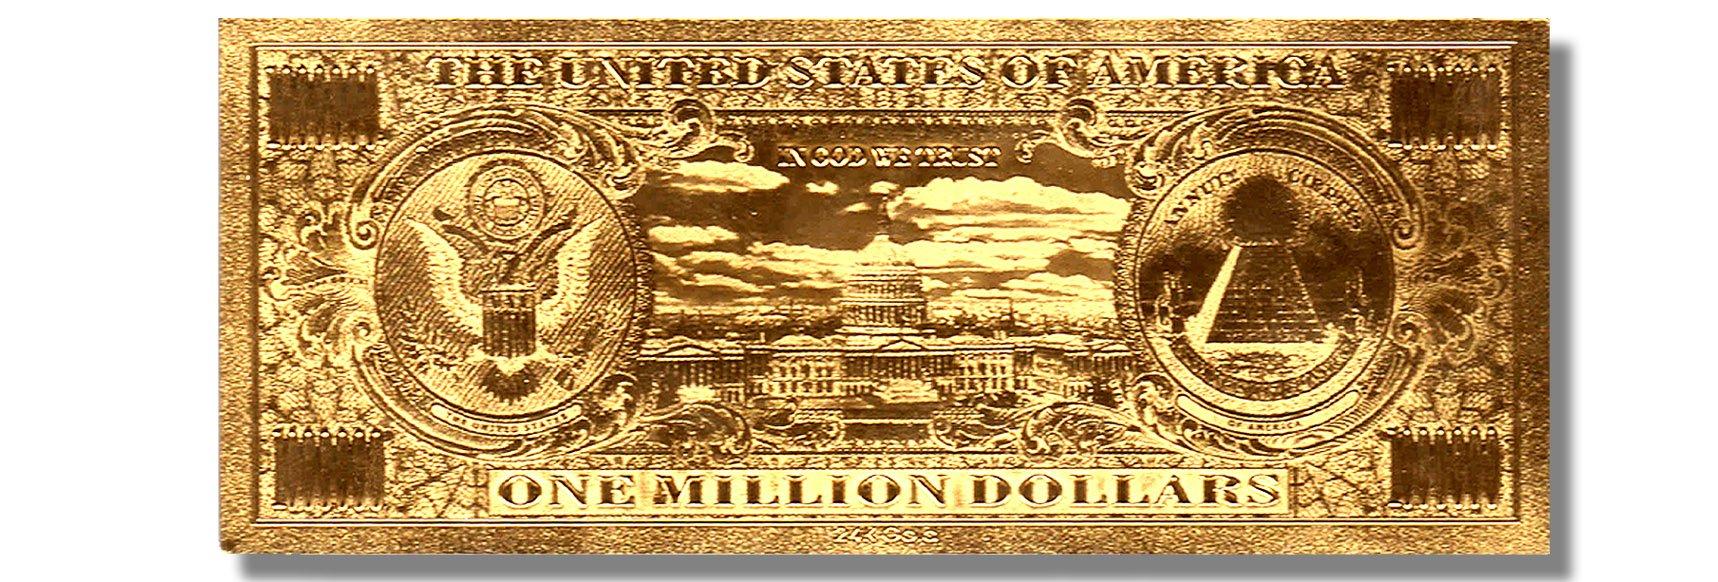 American Art Classics Gold Million Dollar Bill Commemorative by American Art Classics (Image #5)